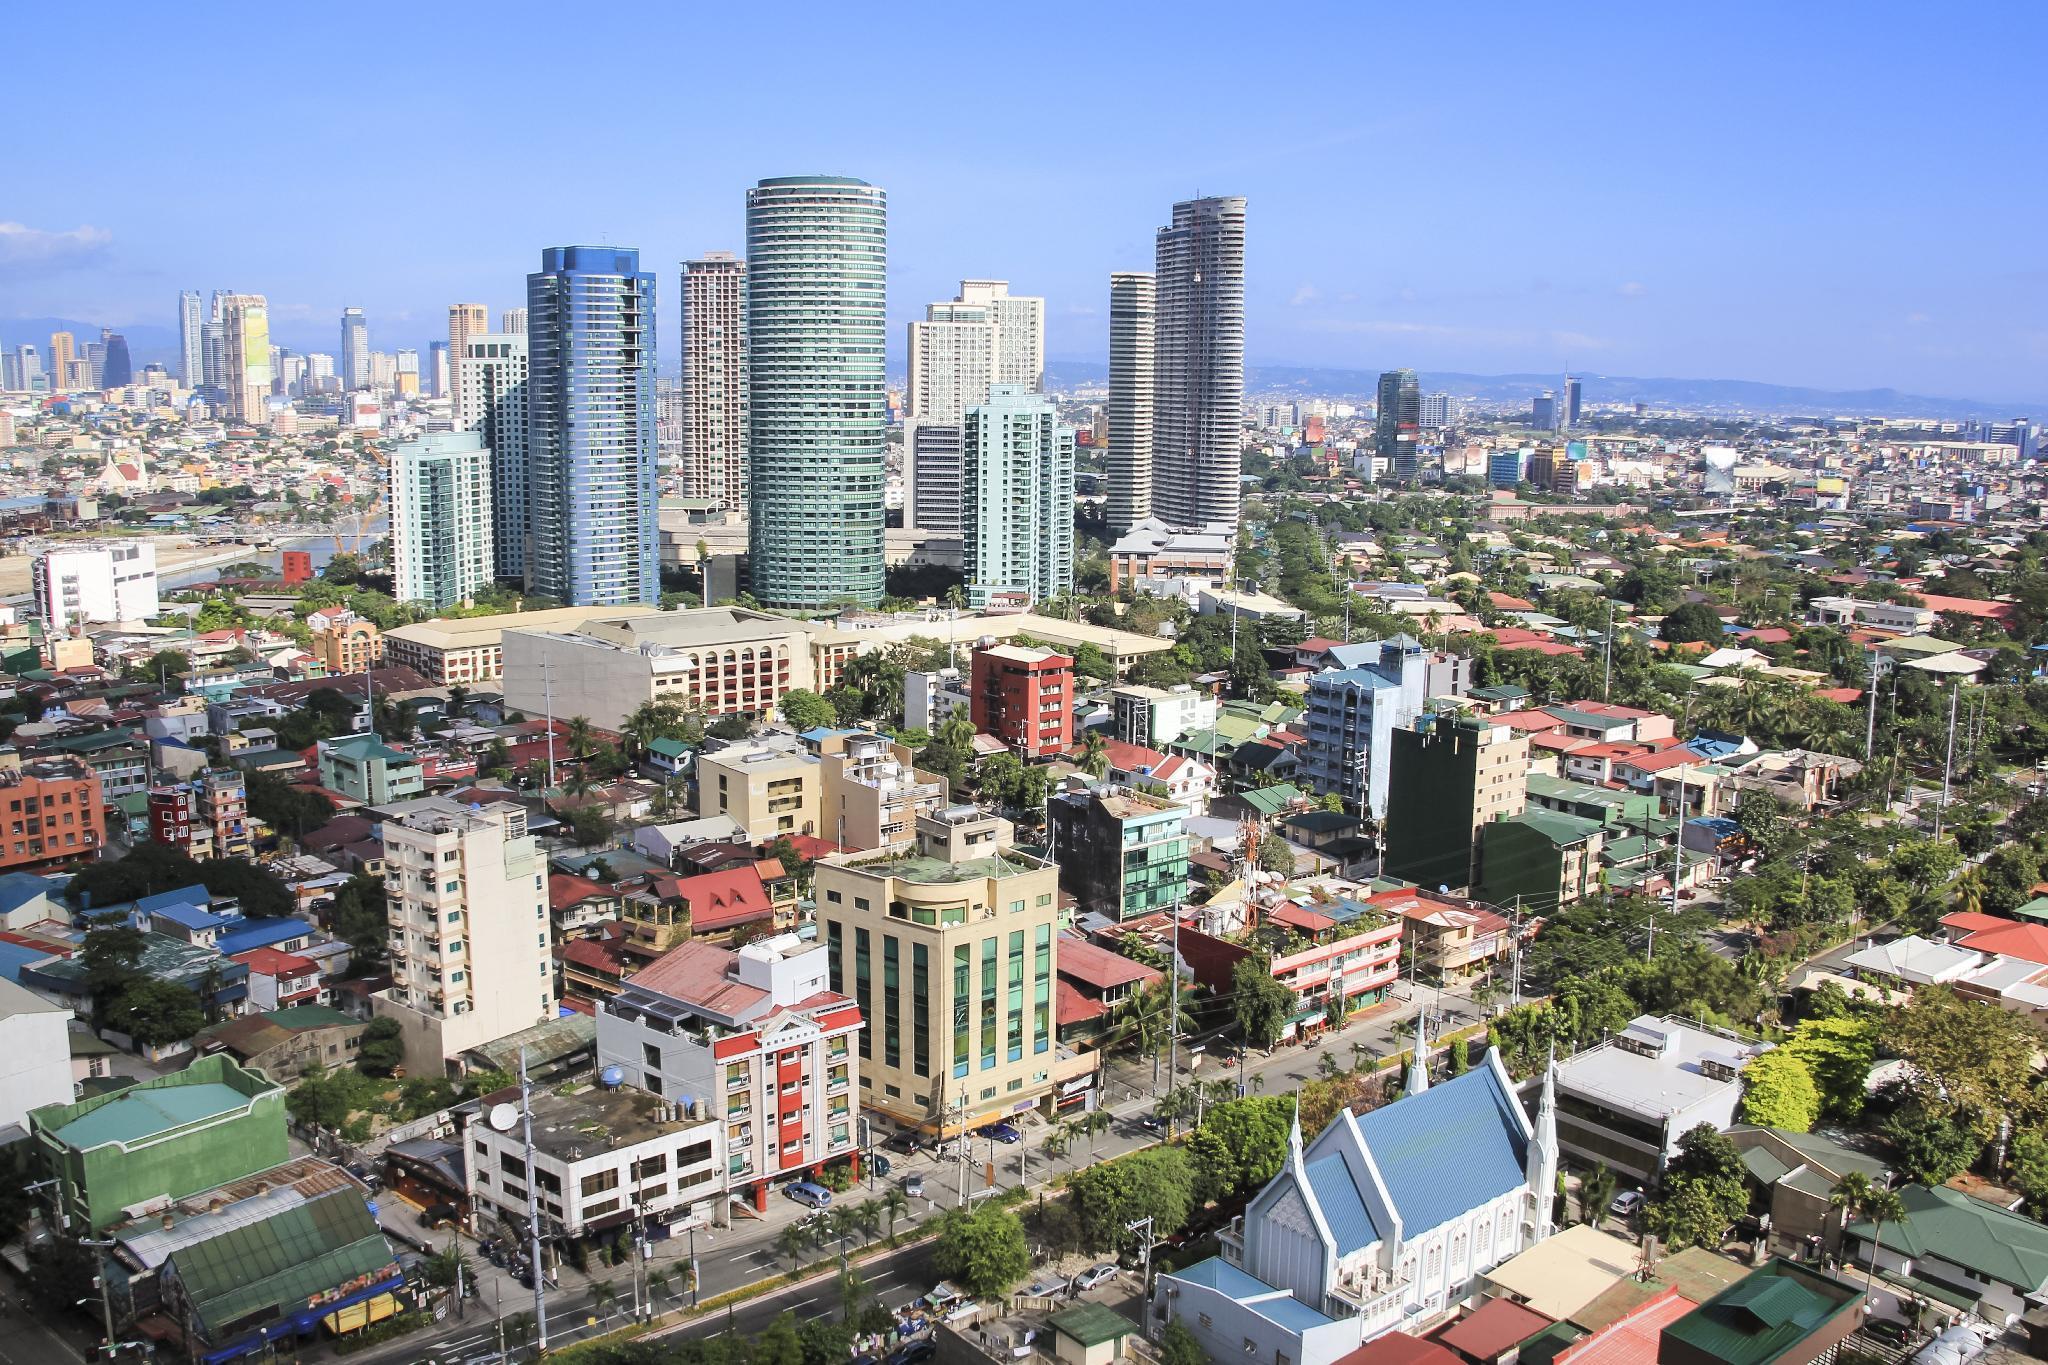 Condo for rent, Mandaluyong